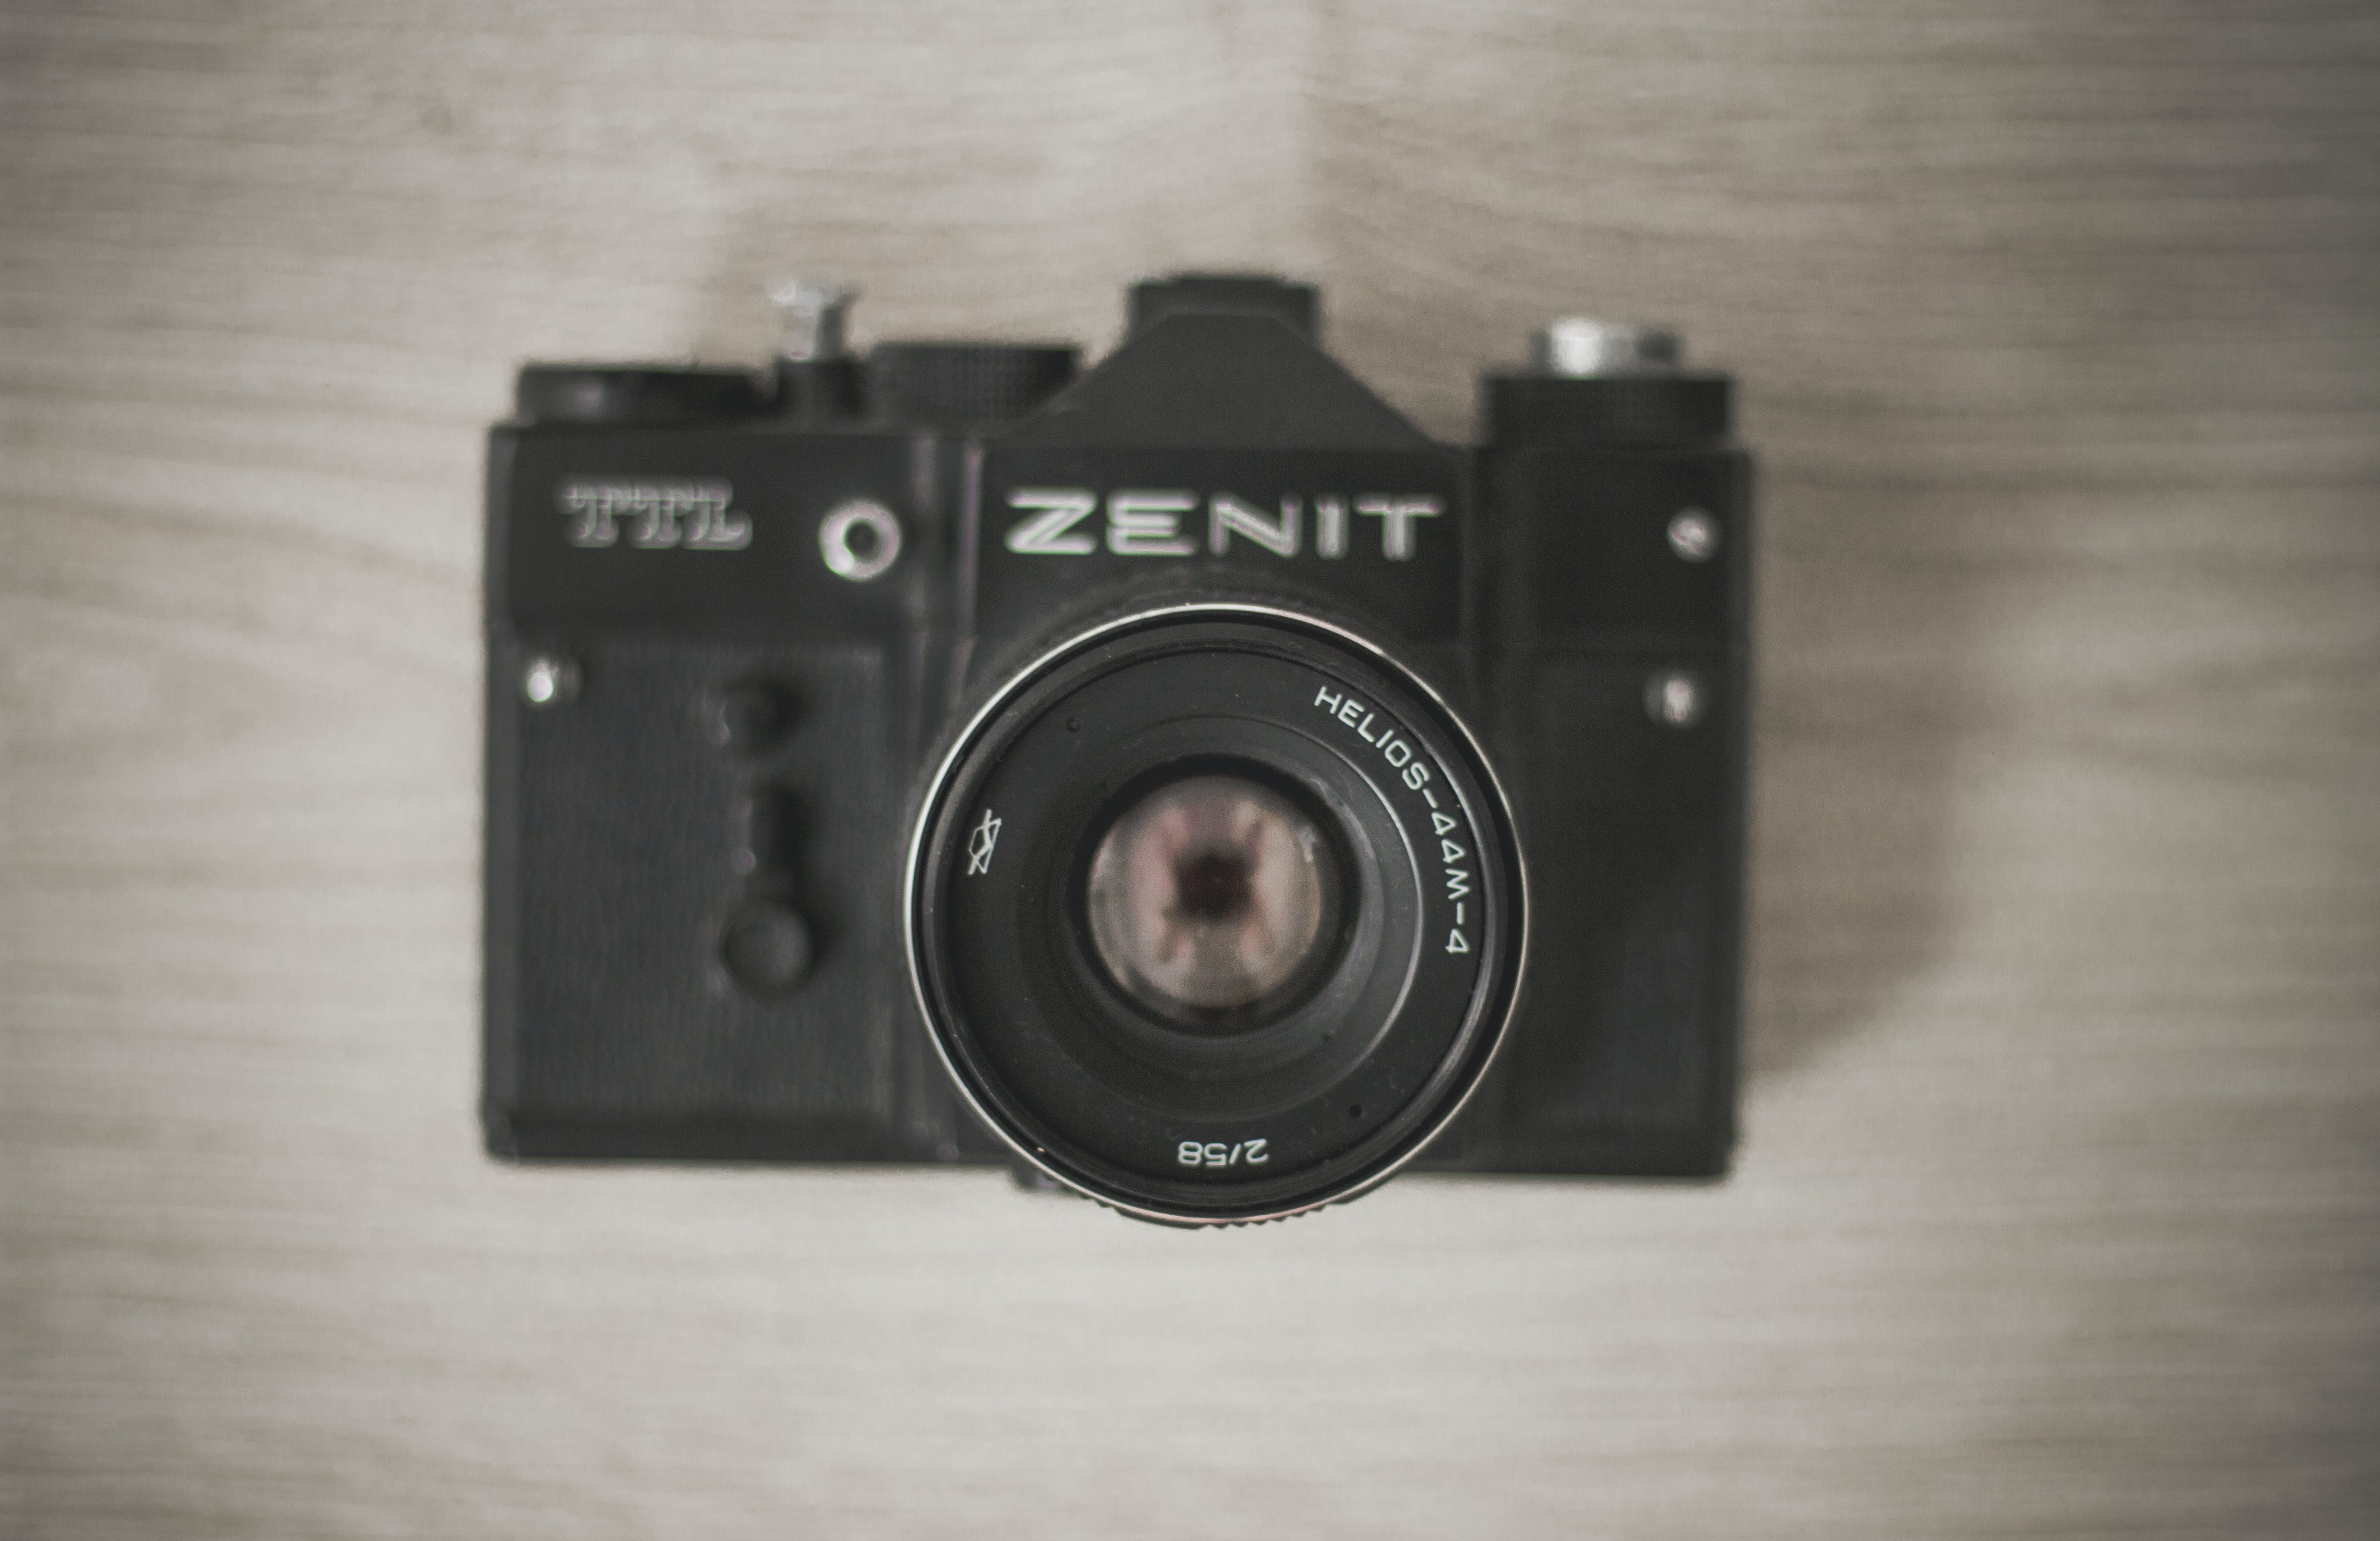 Flat-lay Photograph of Black Zenit Camera